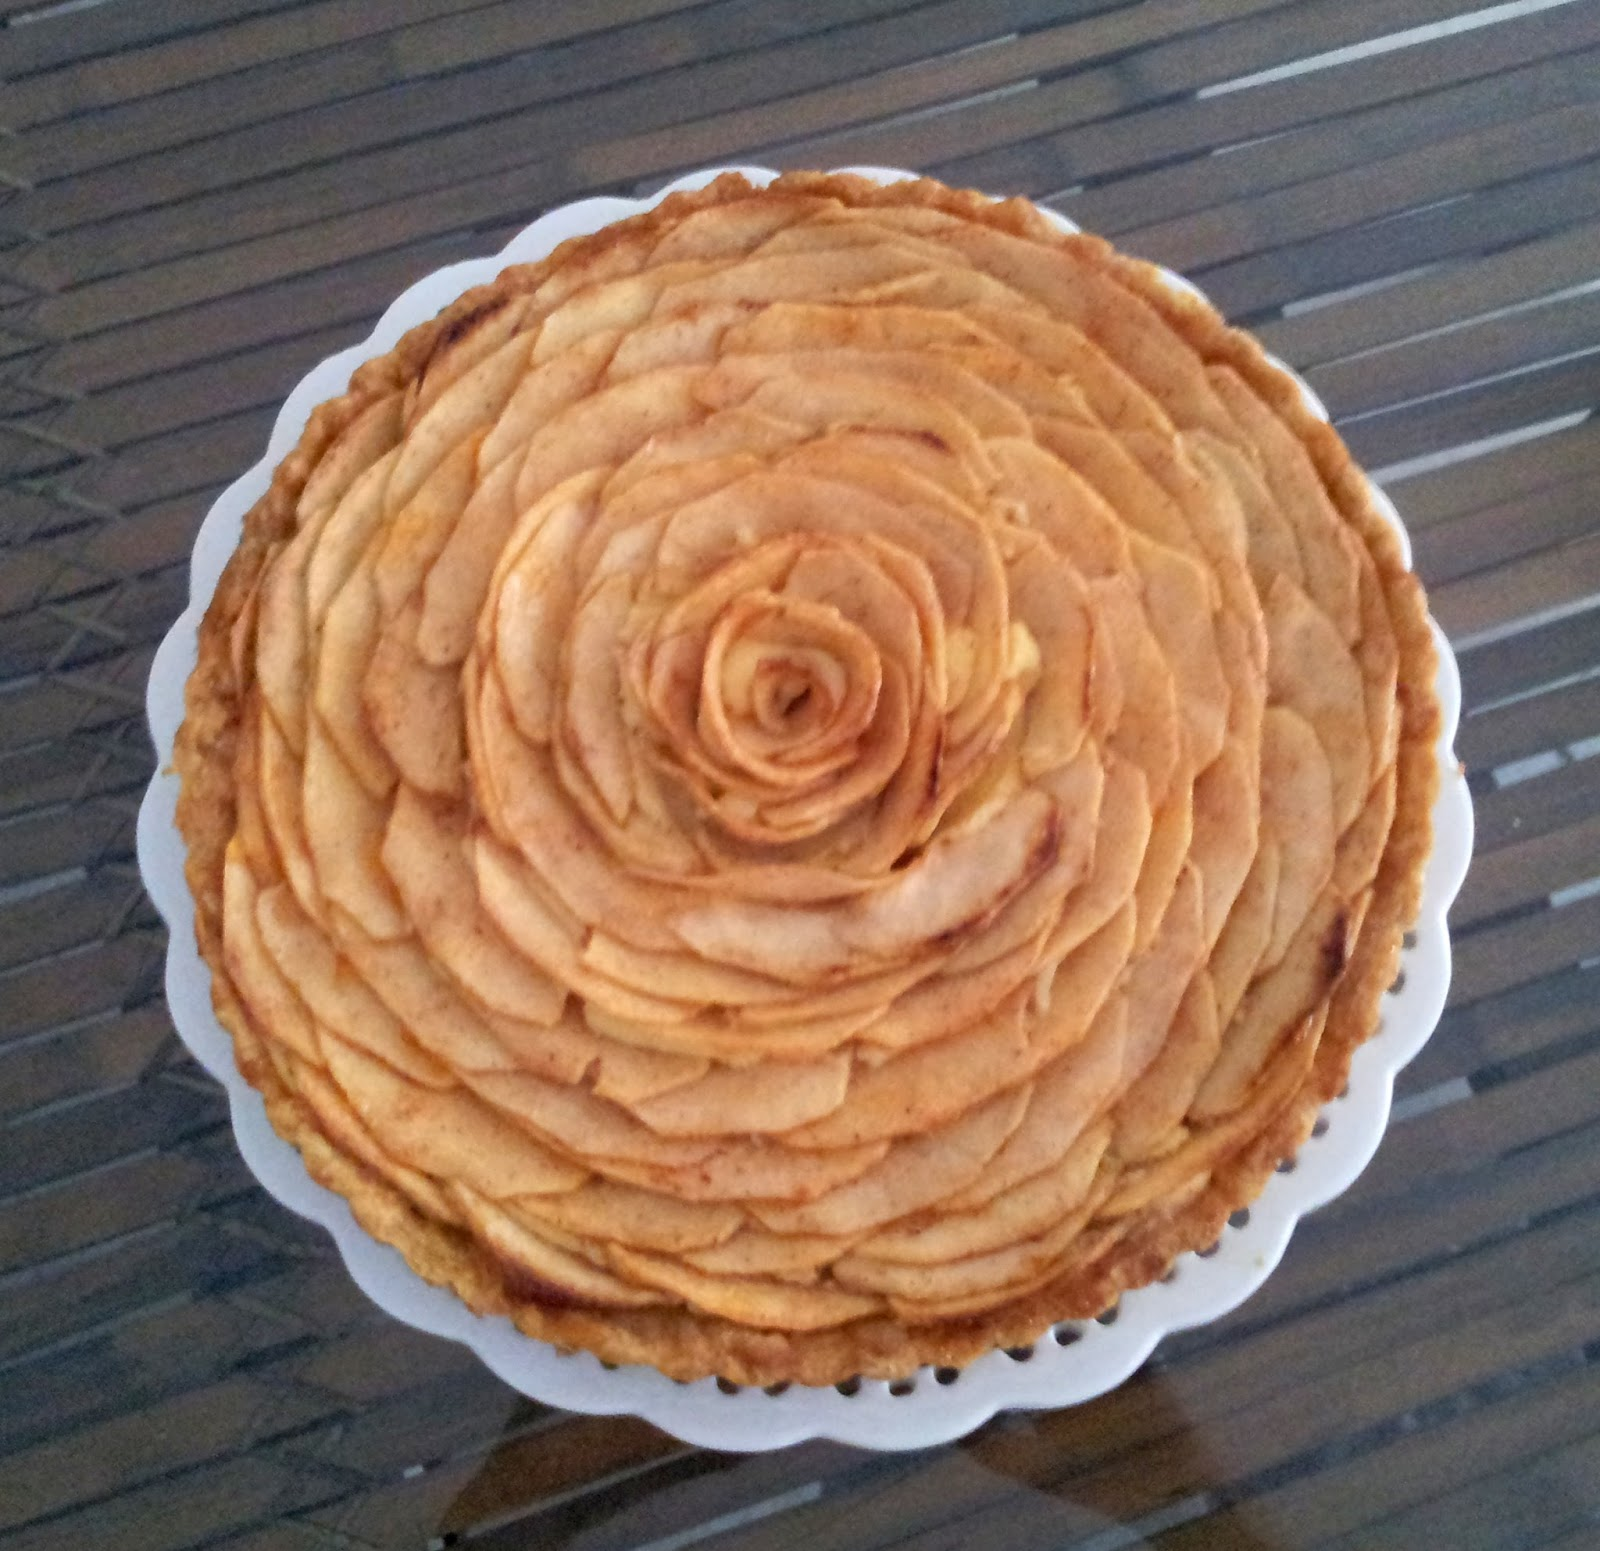 Culinary Kitchenette French Apple Tart By Karen Yee